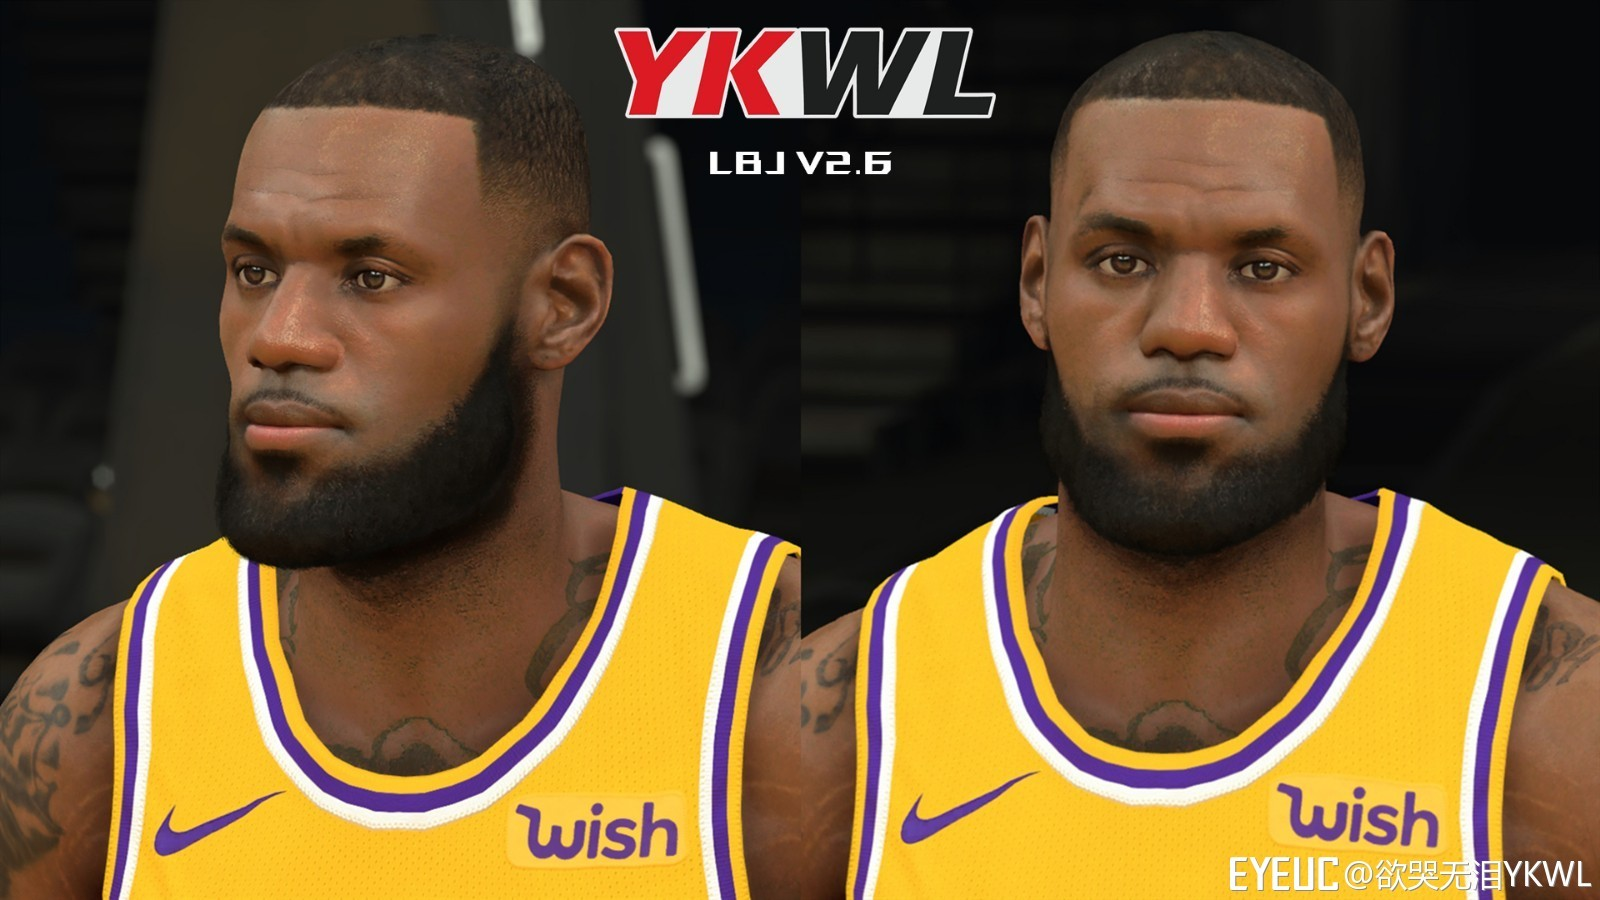 7ddd3aff9cbb NBA 2K19 - LeBron James Cyberface v2.6 by YKWL - Shuajota